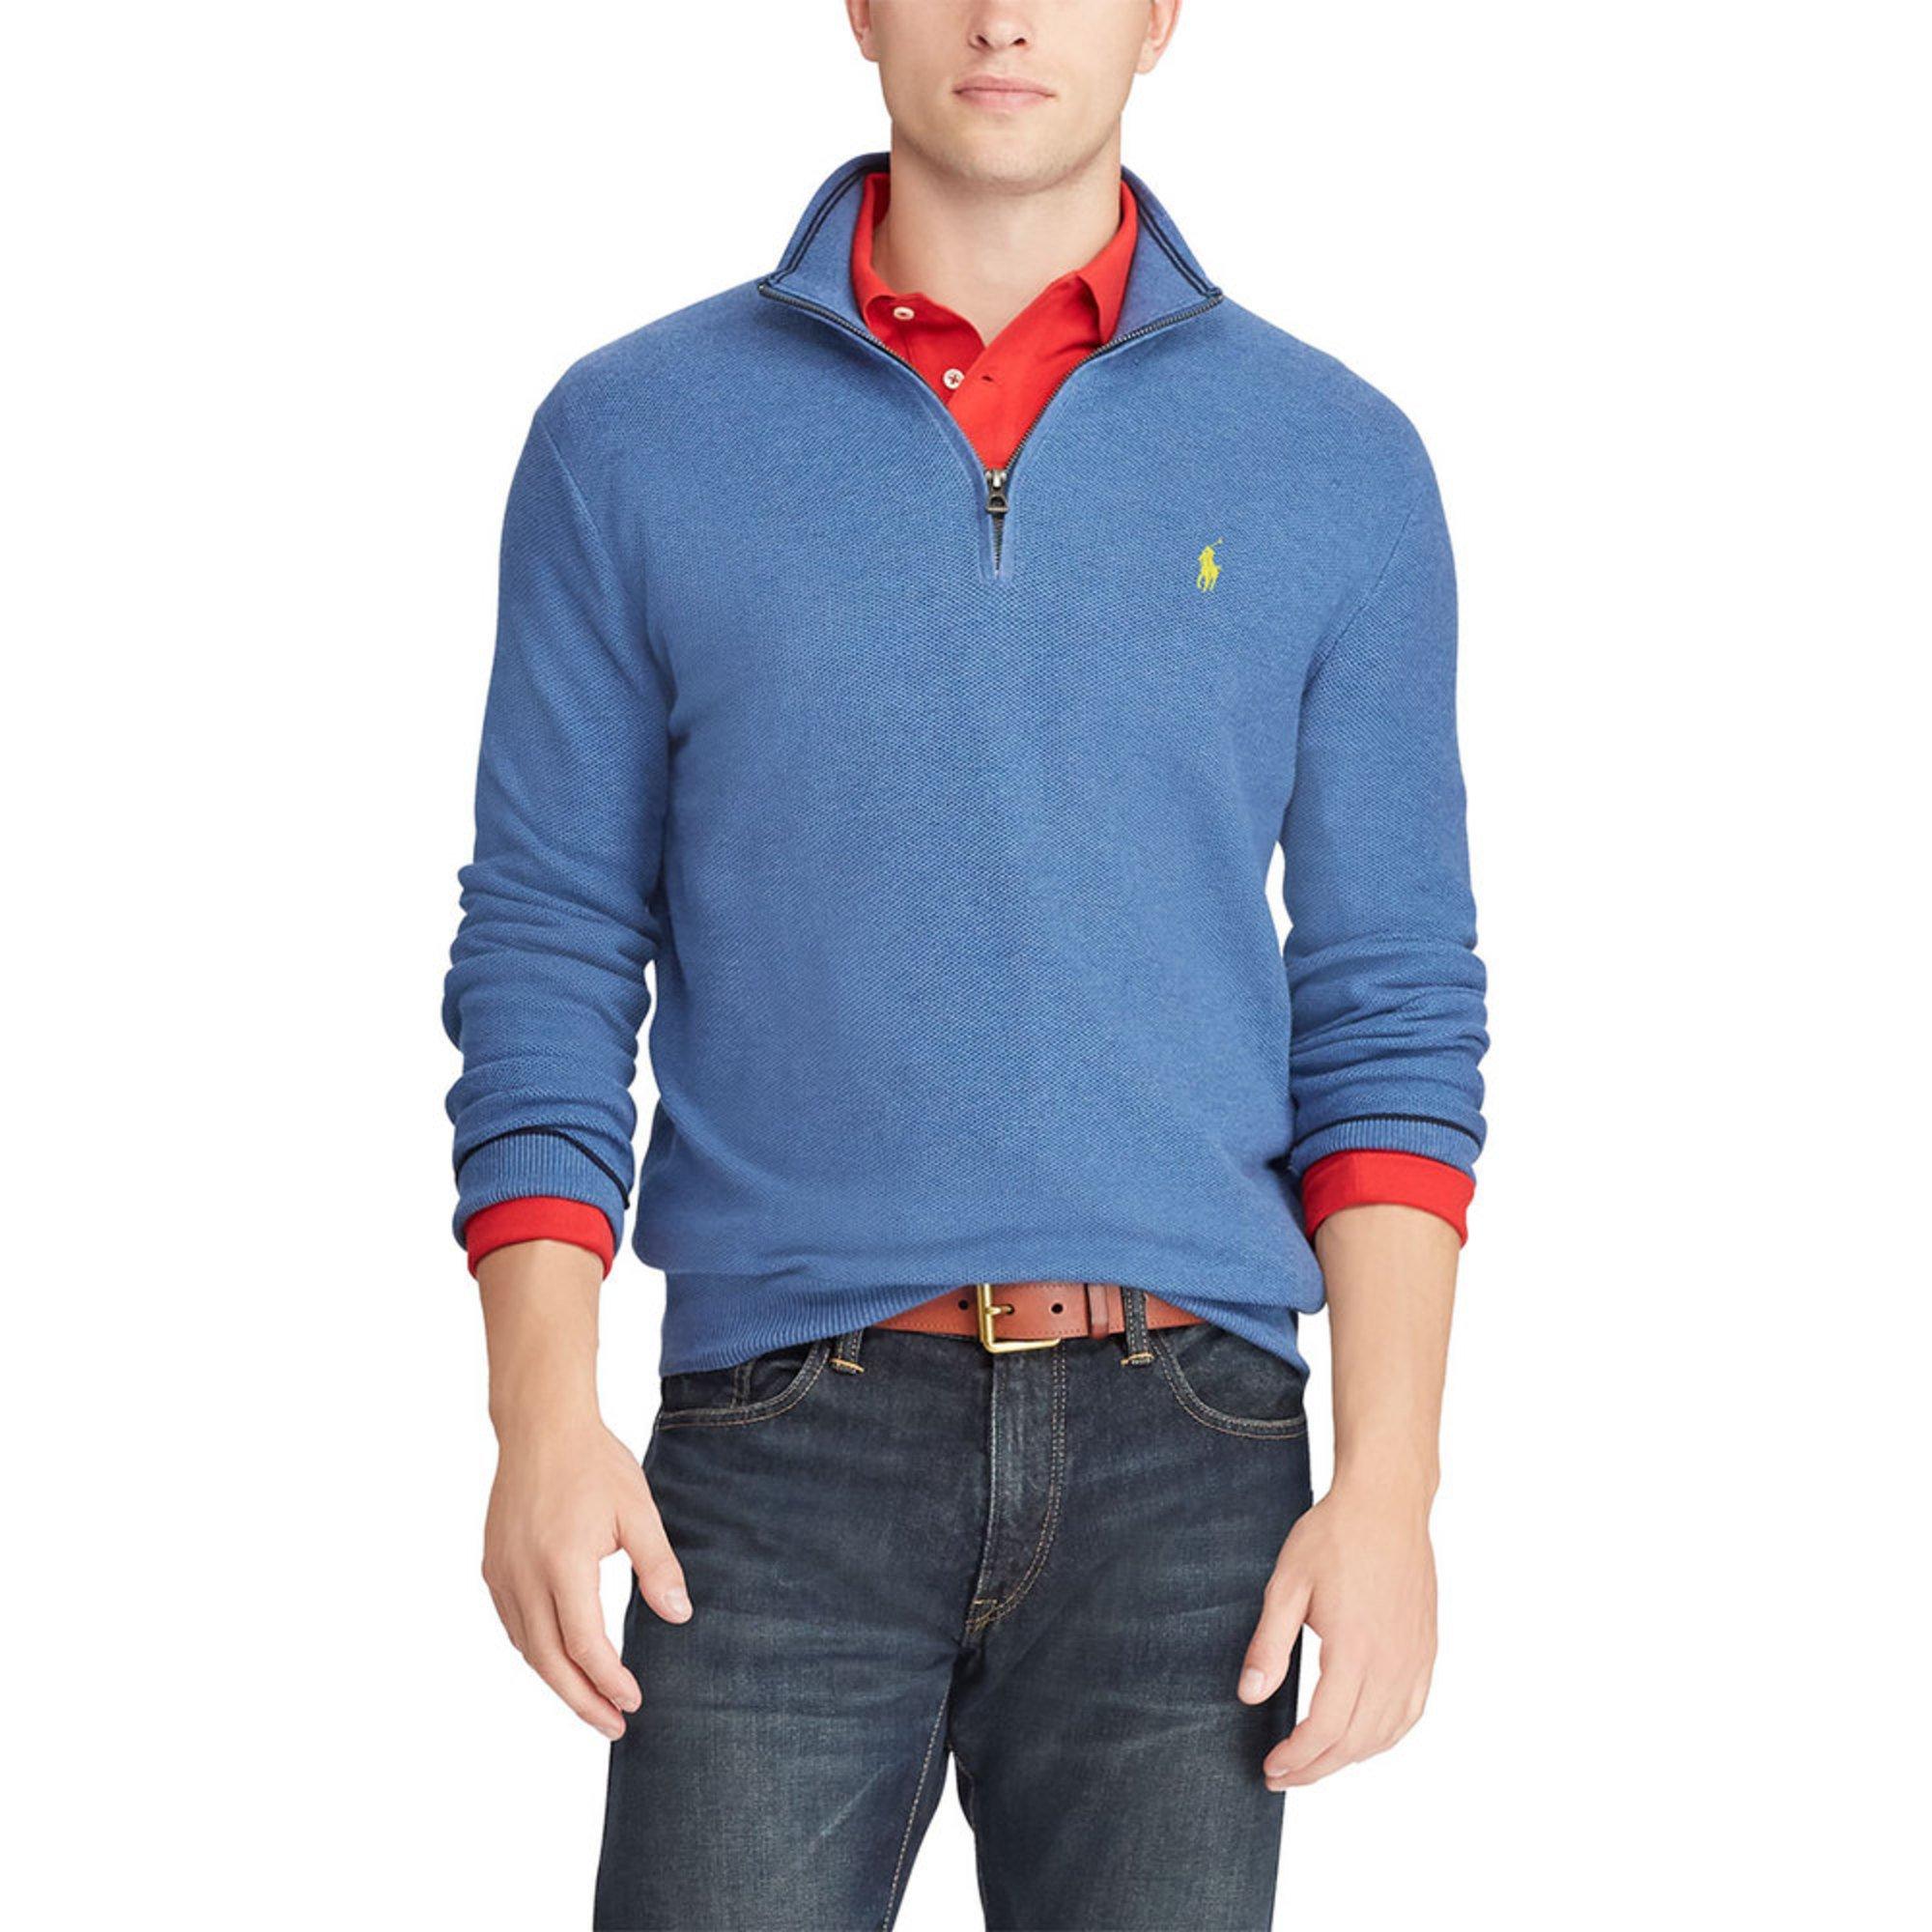 98f47a847 Polo Ralph Lauren Men s 1 2 Zip Pima Cotton Sweater